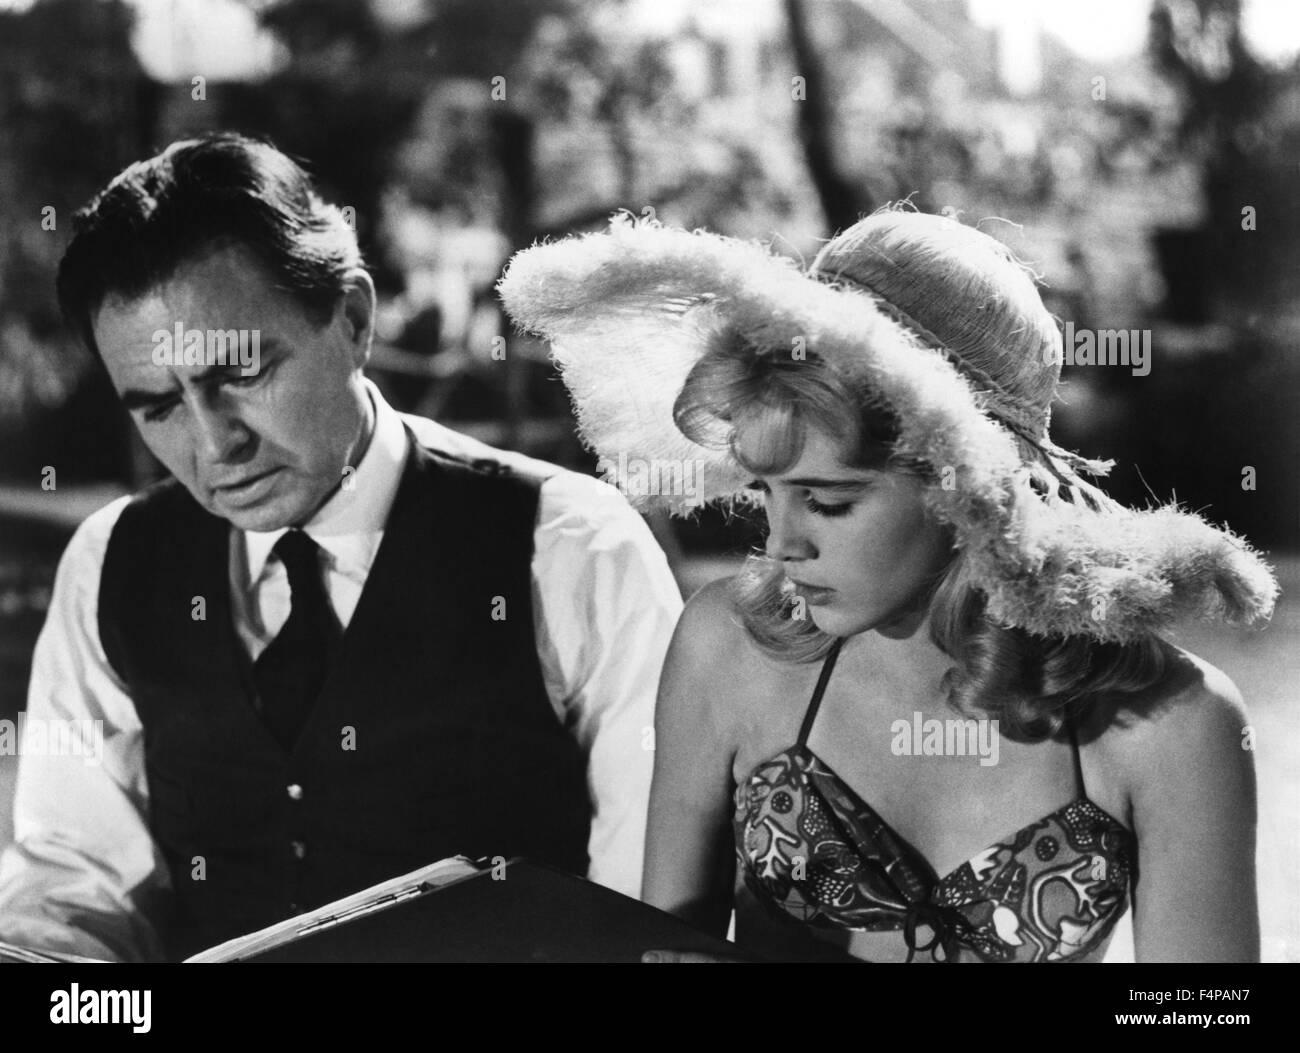 Sue lyon, James Mason / Lolita 1962 directed by Stanley Kubrick - Stock Image